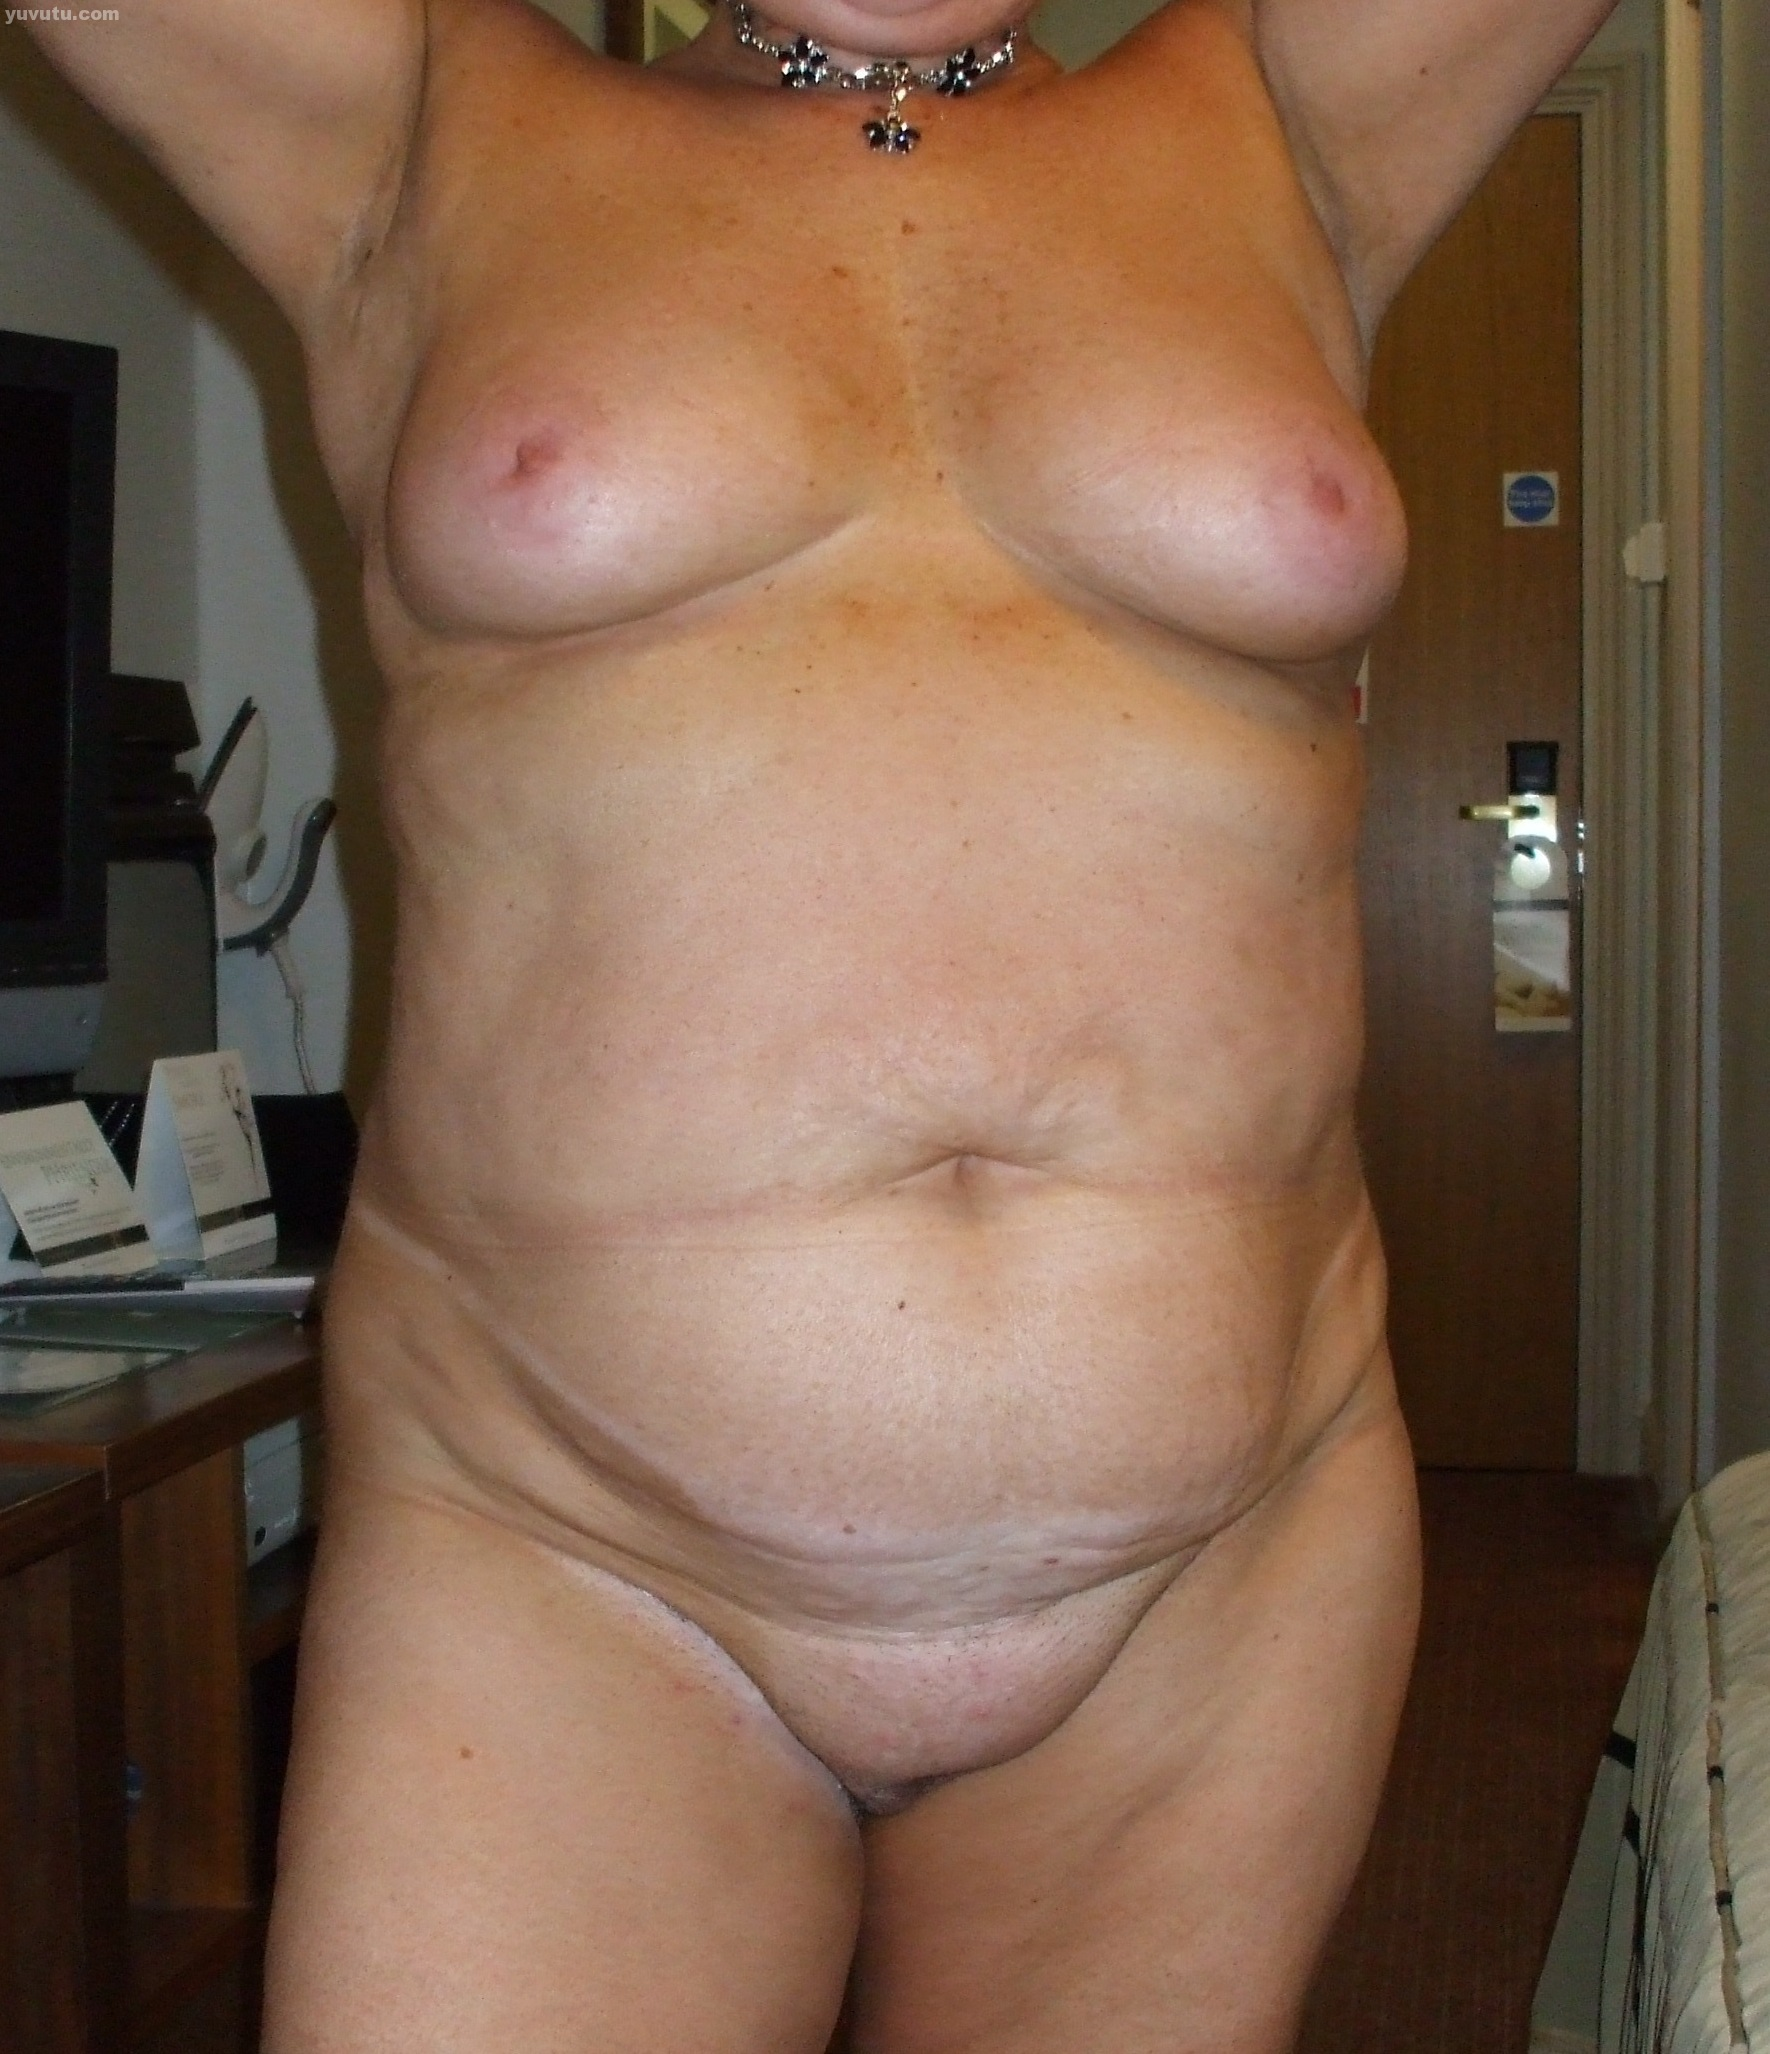 tan lines anal